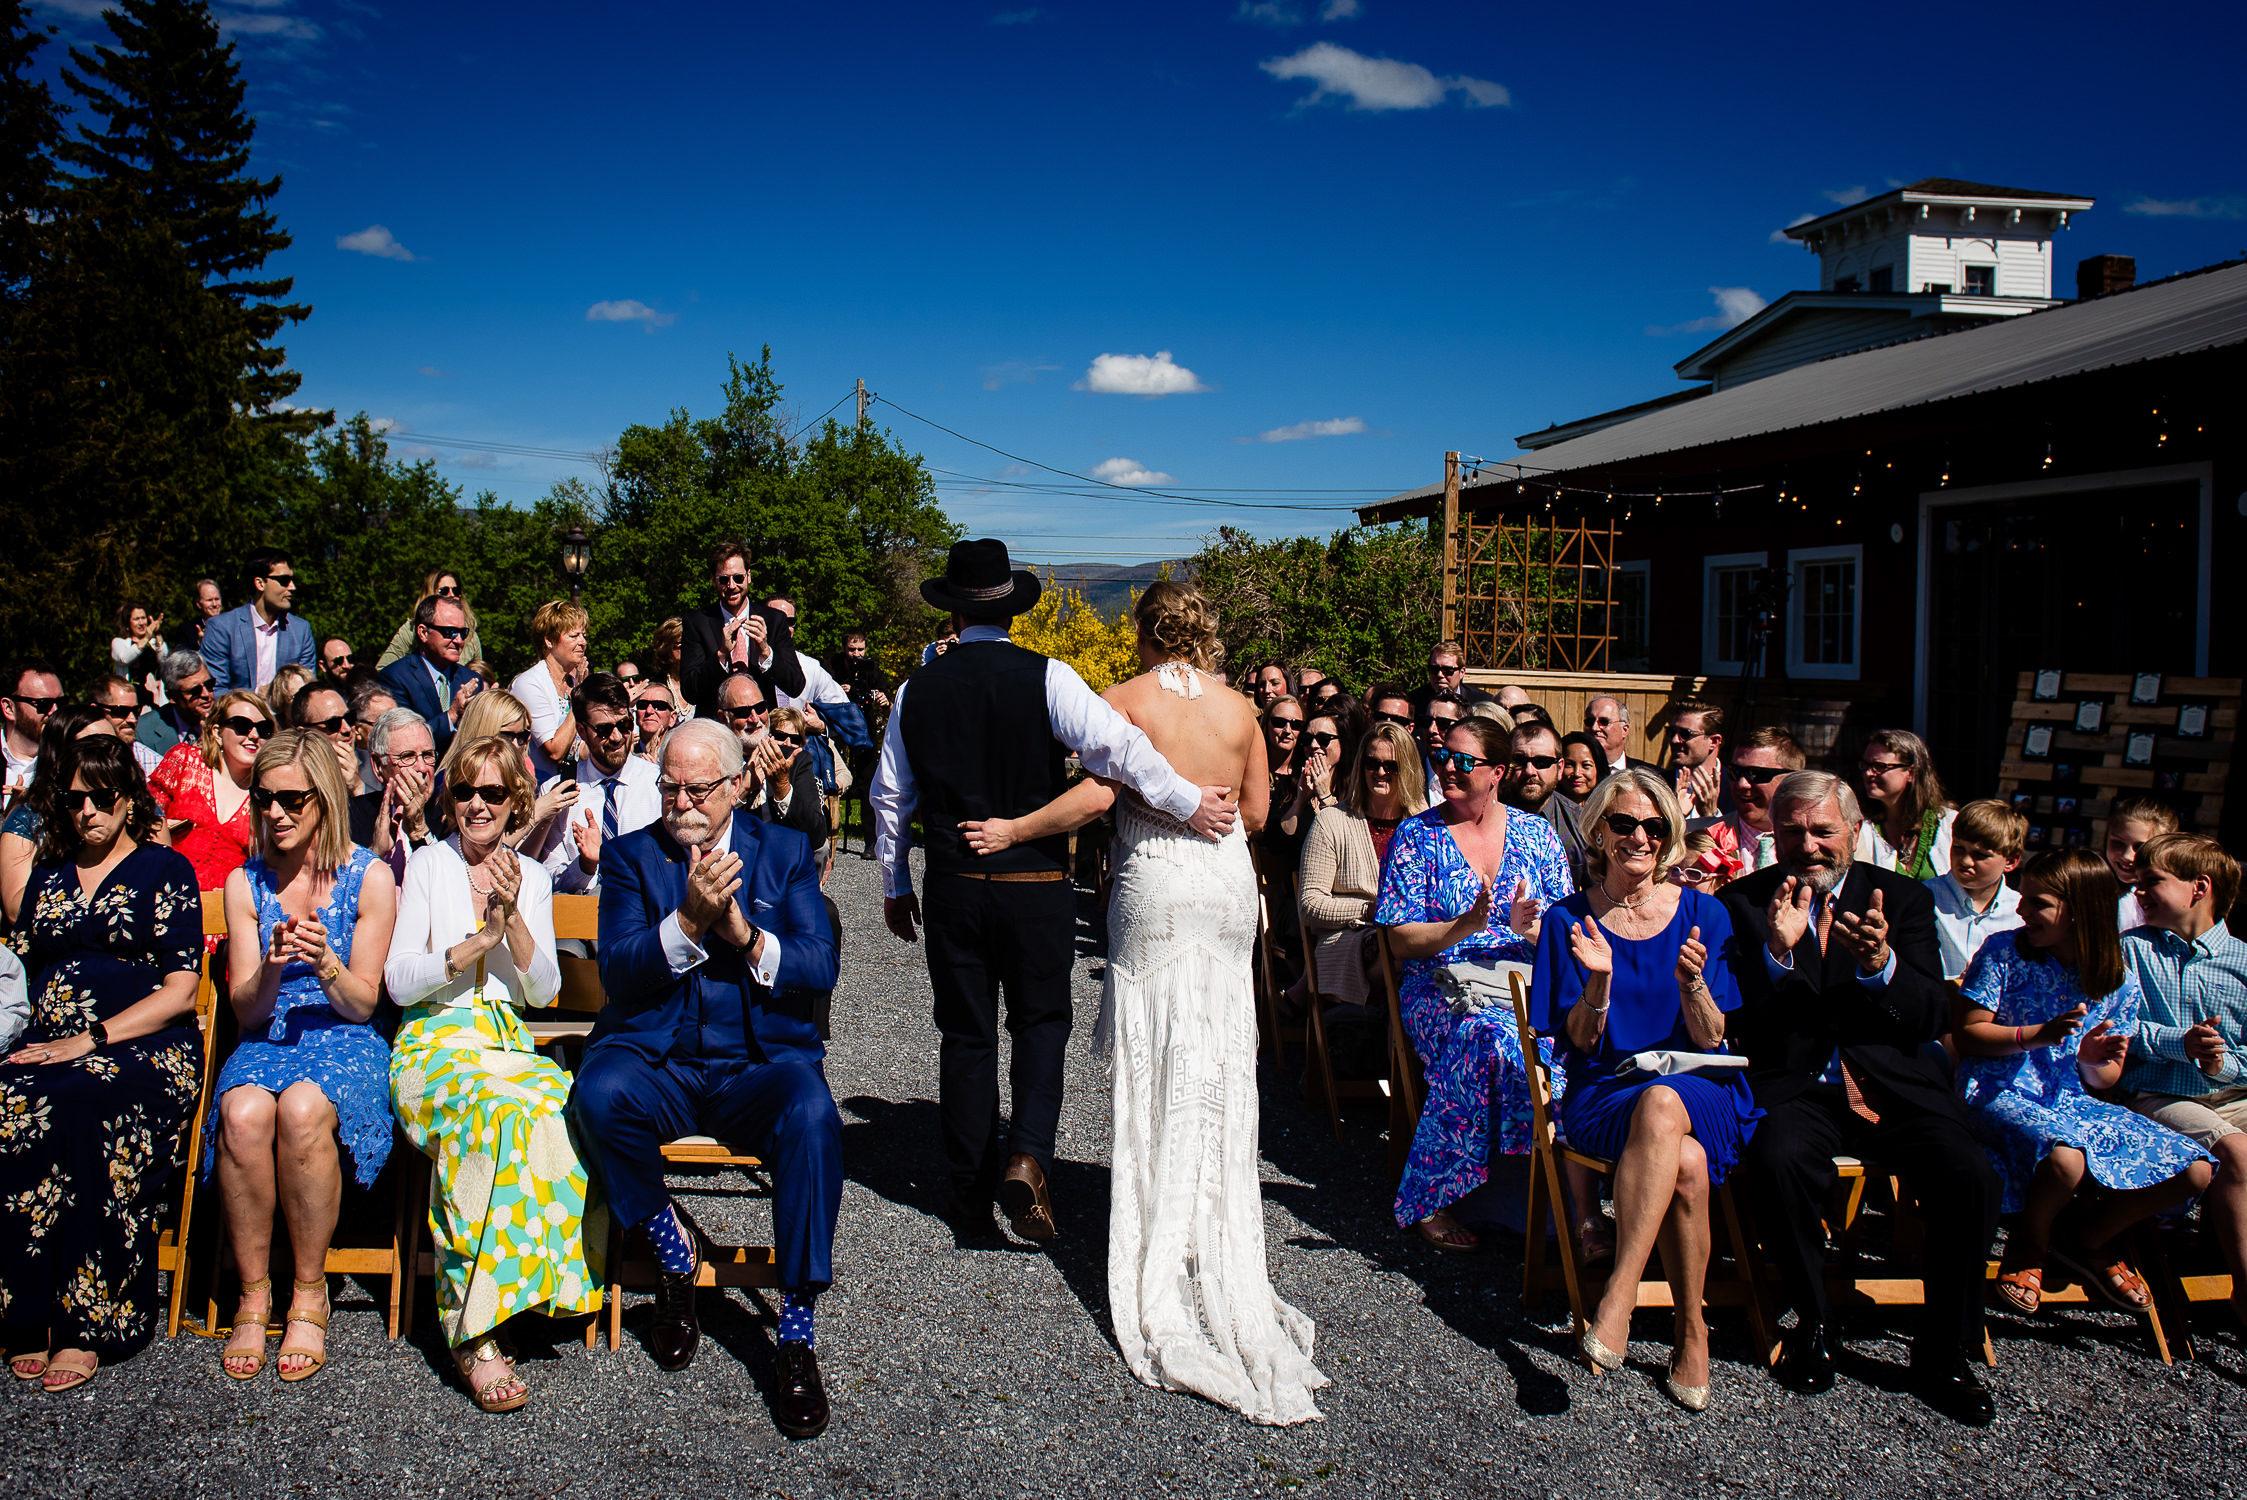 tourterelle-vermont-wedding-photographers-020-2-2247x1500.jpg